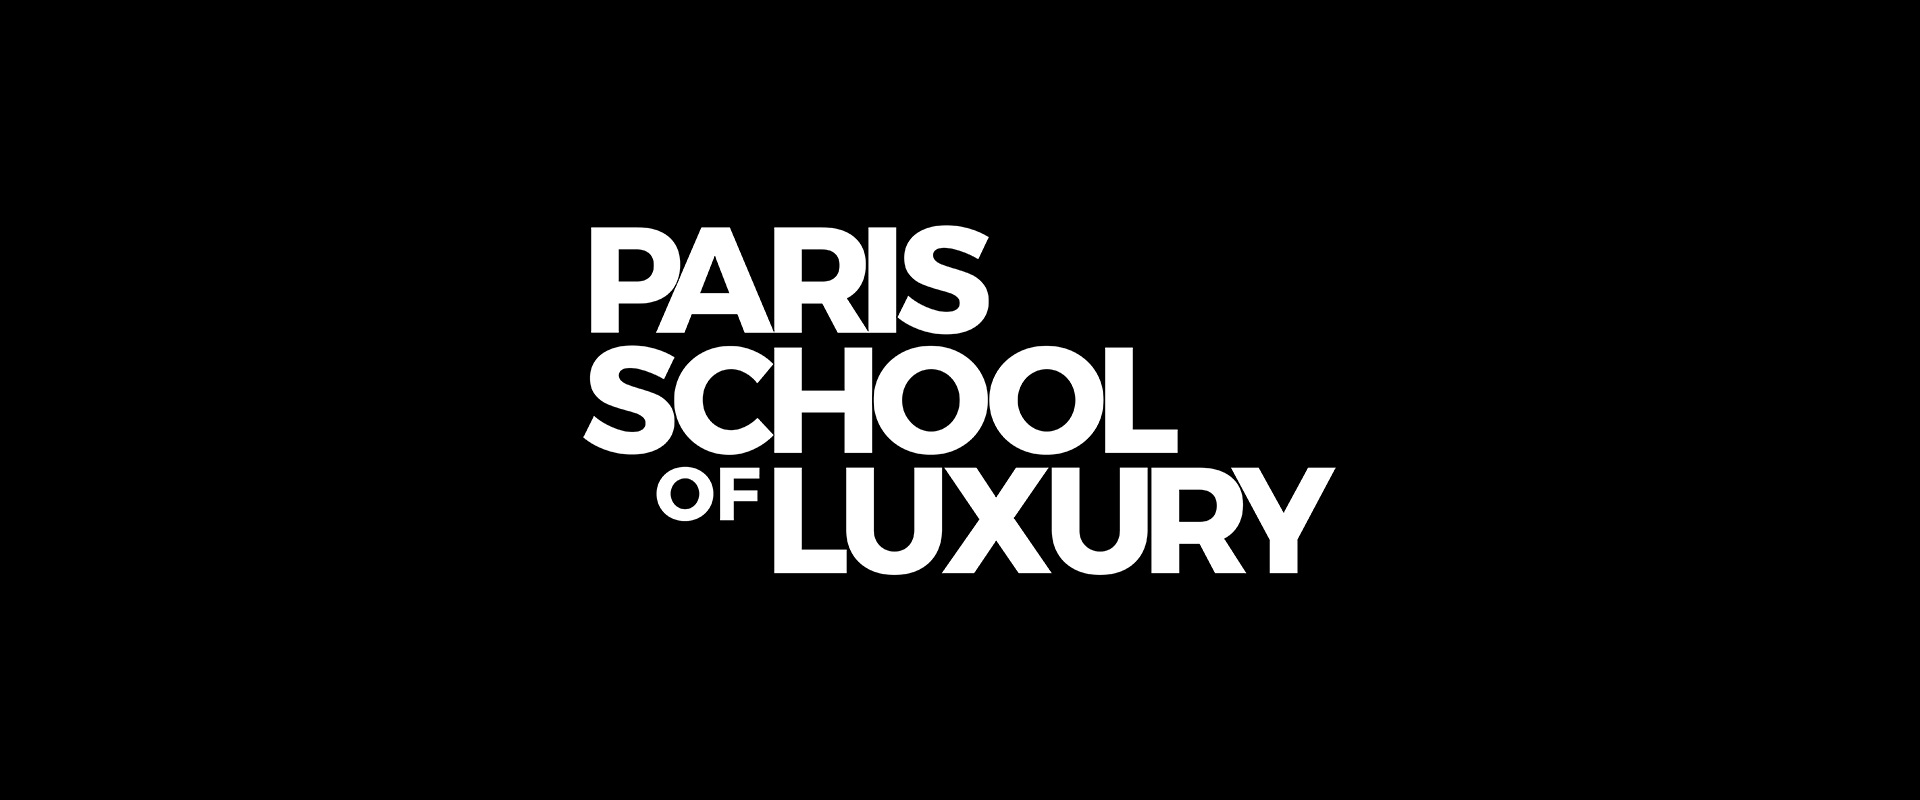 Paris School of Luxury : Luxe, mode, beauté